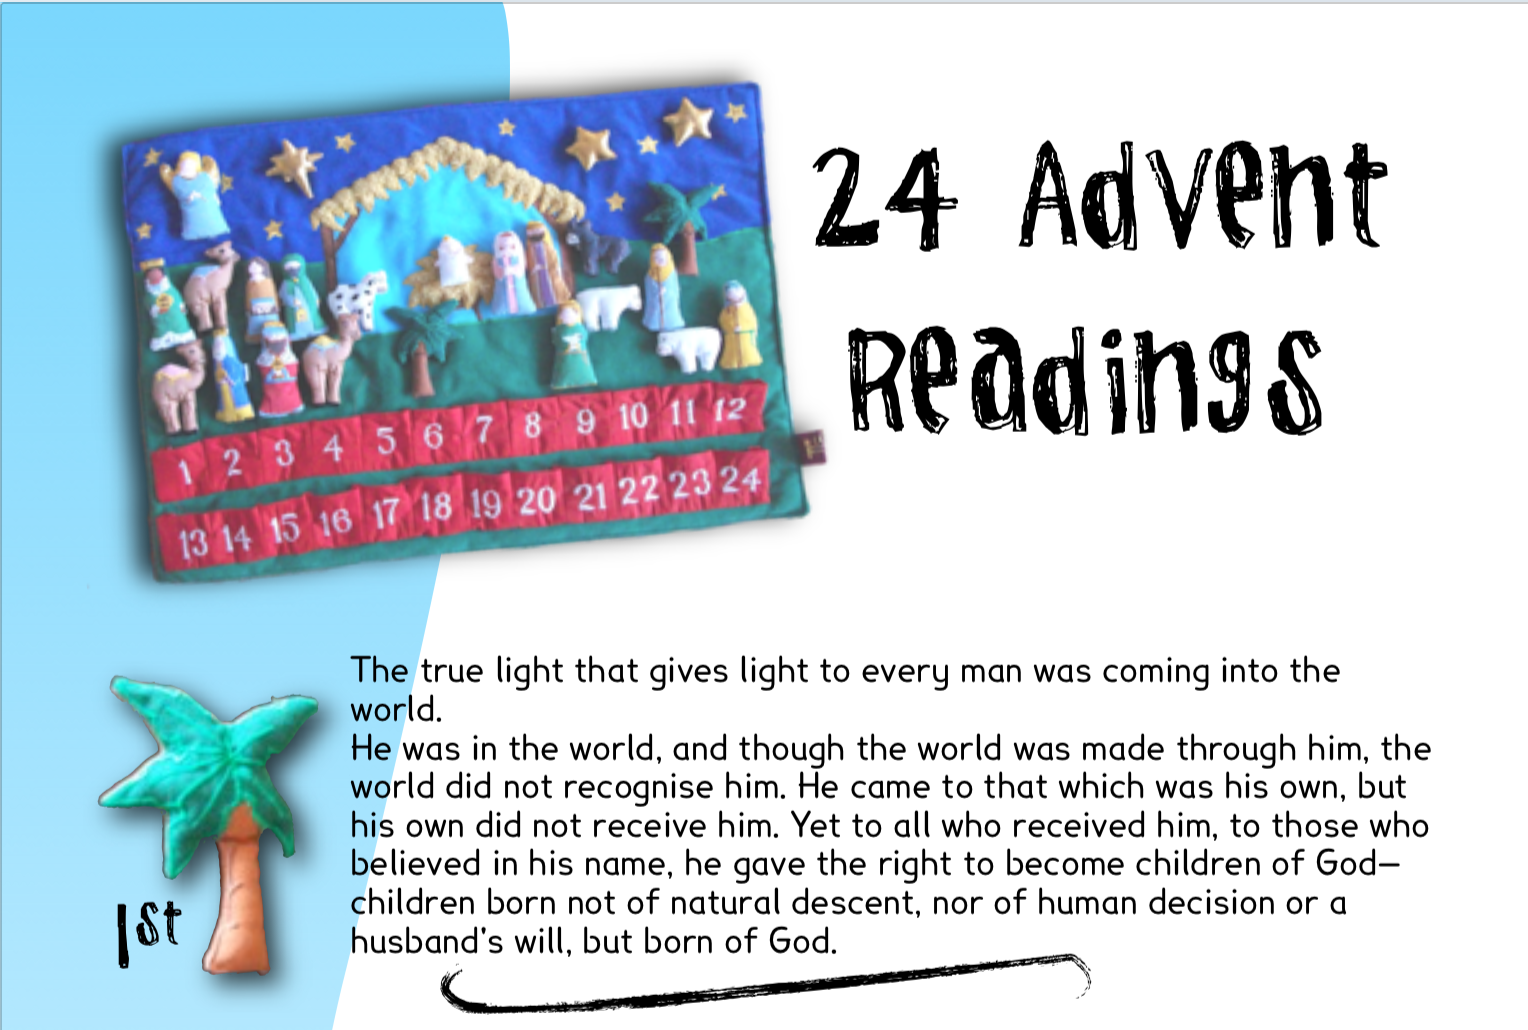 24 Advent Readings